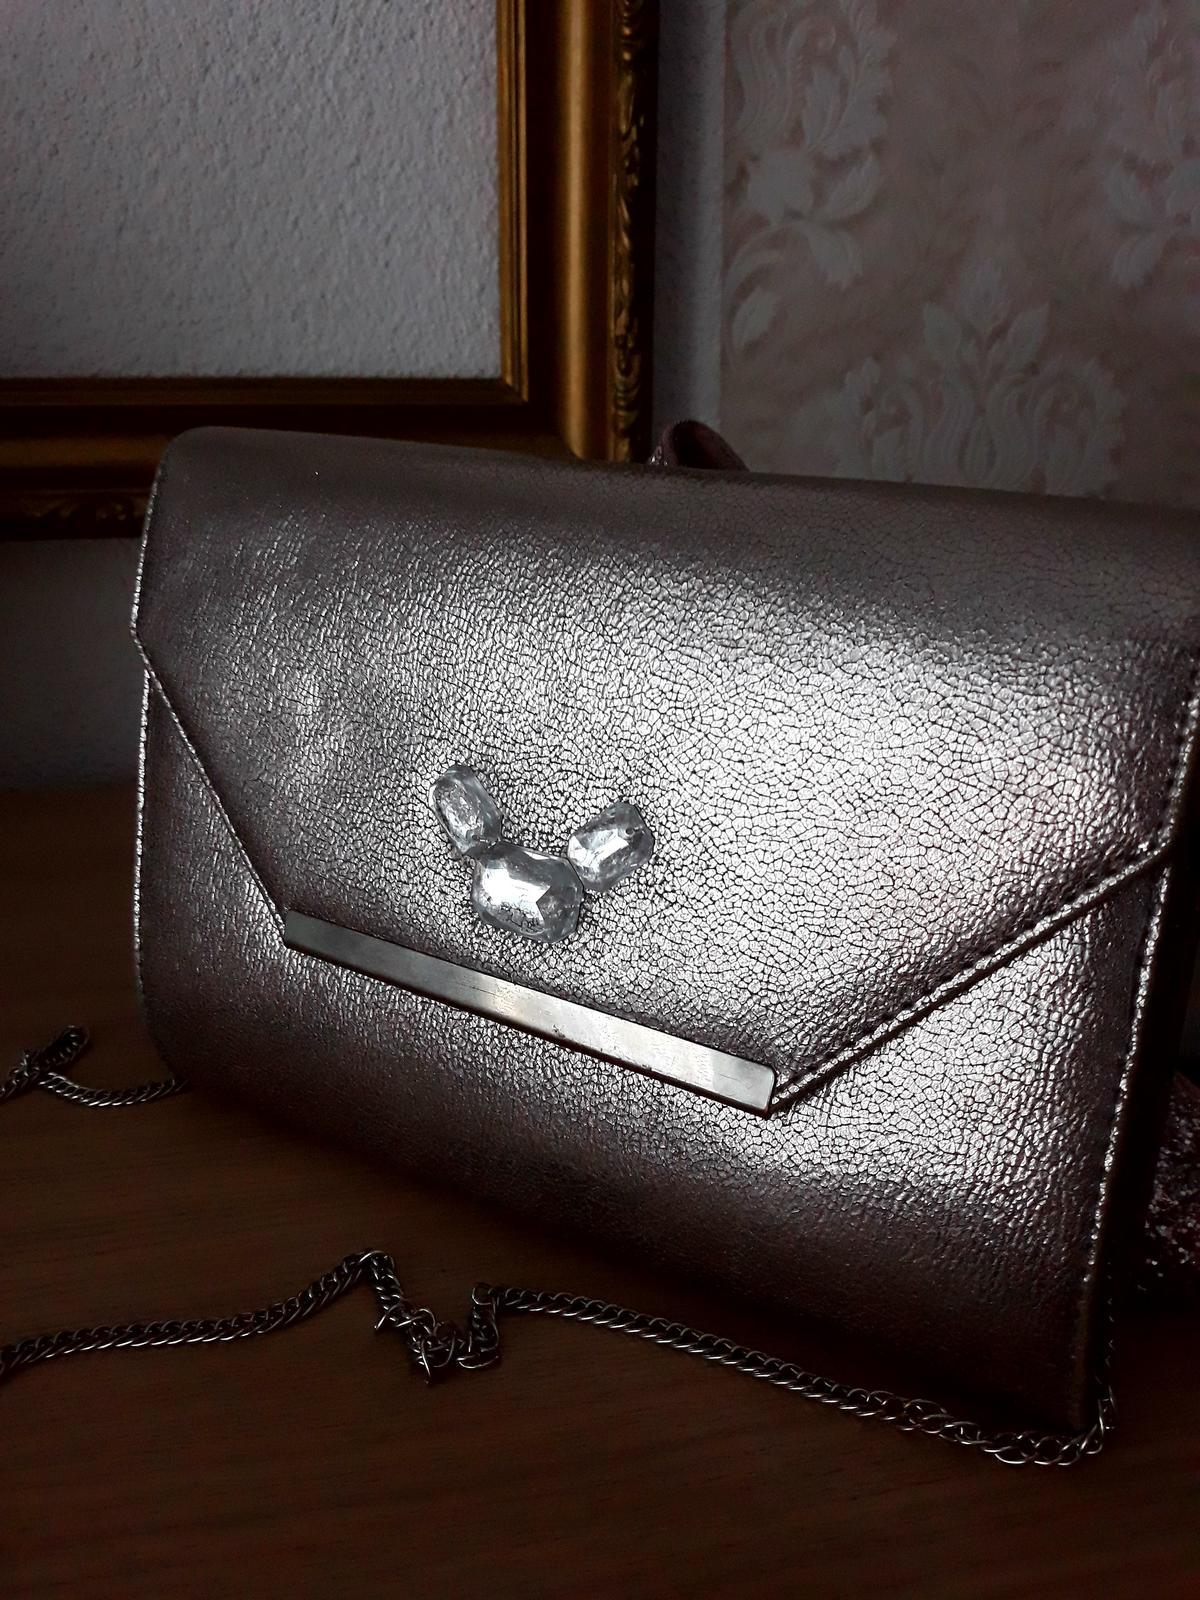 Strieborná kabelka Six - Obrázok č. 2